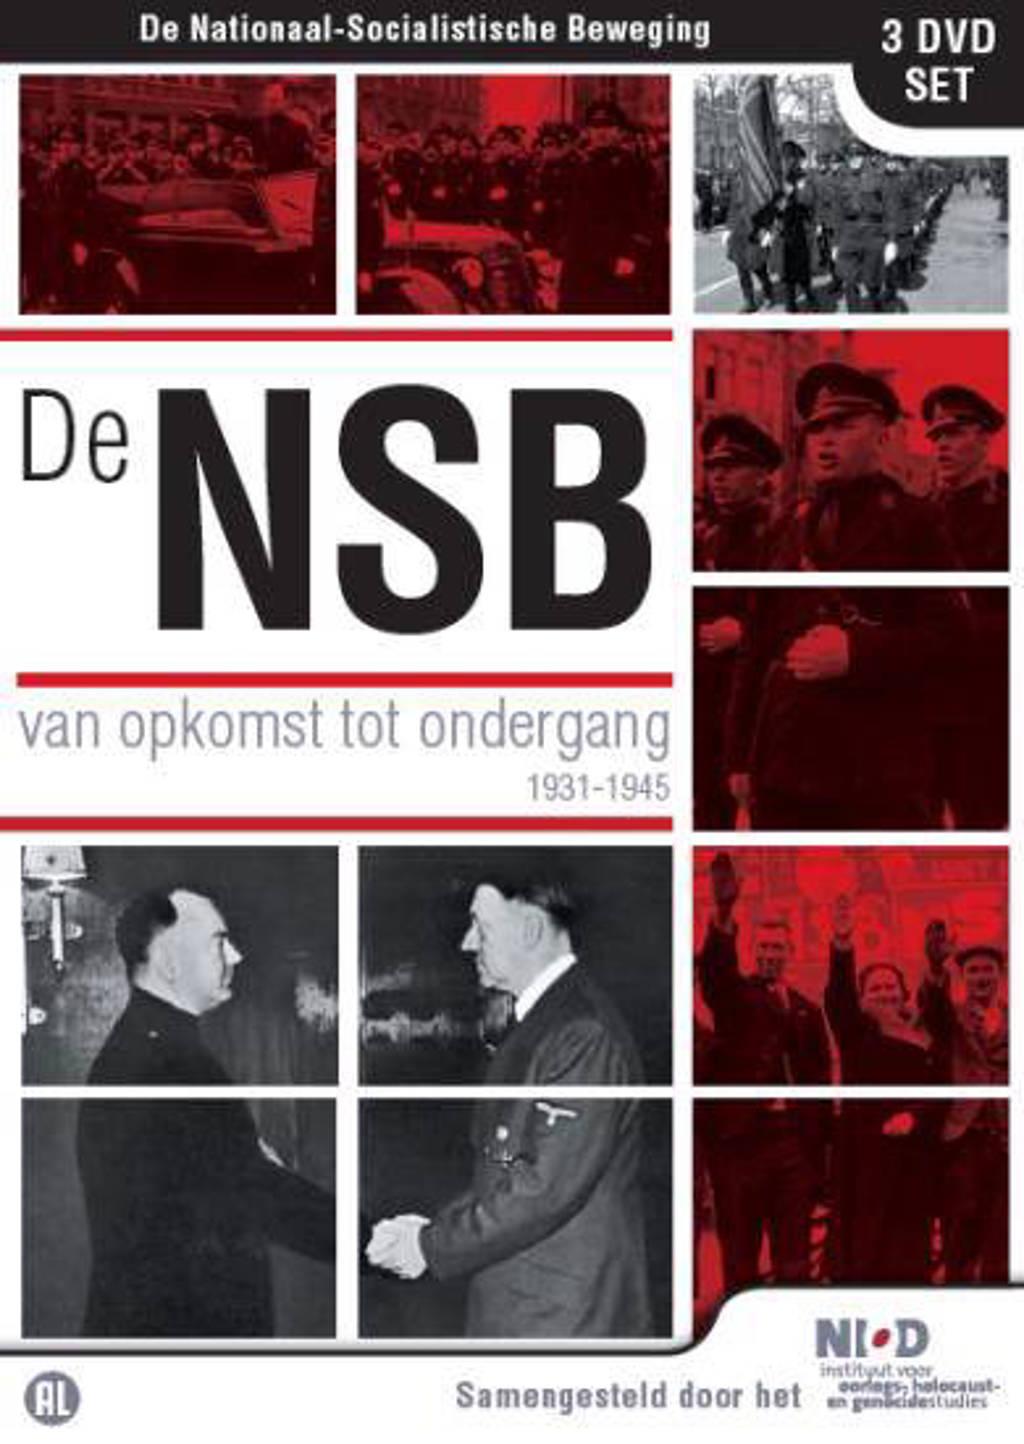 De NSB - Van opkomst tot ondergang (DVD)